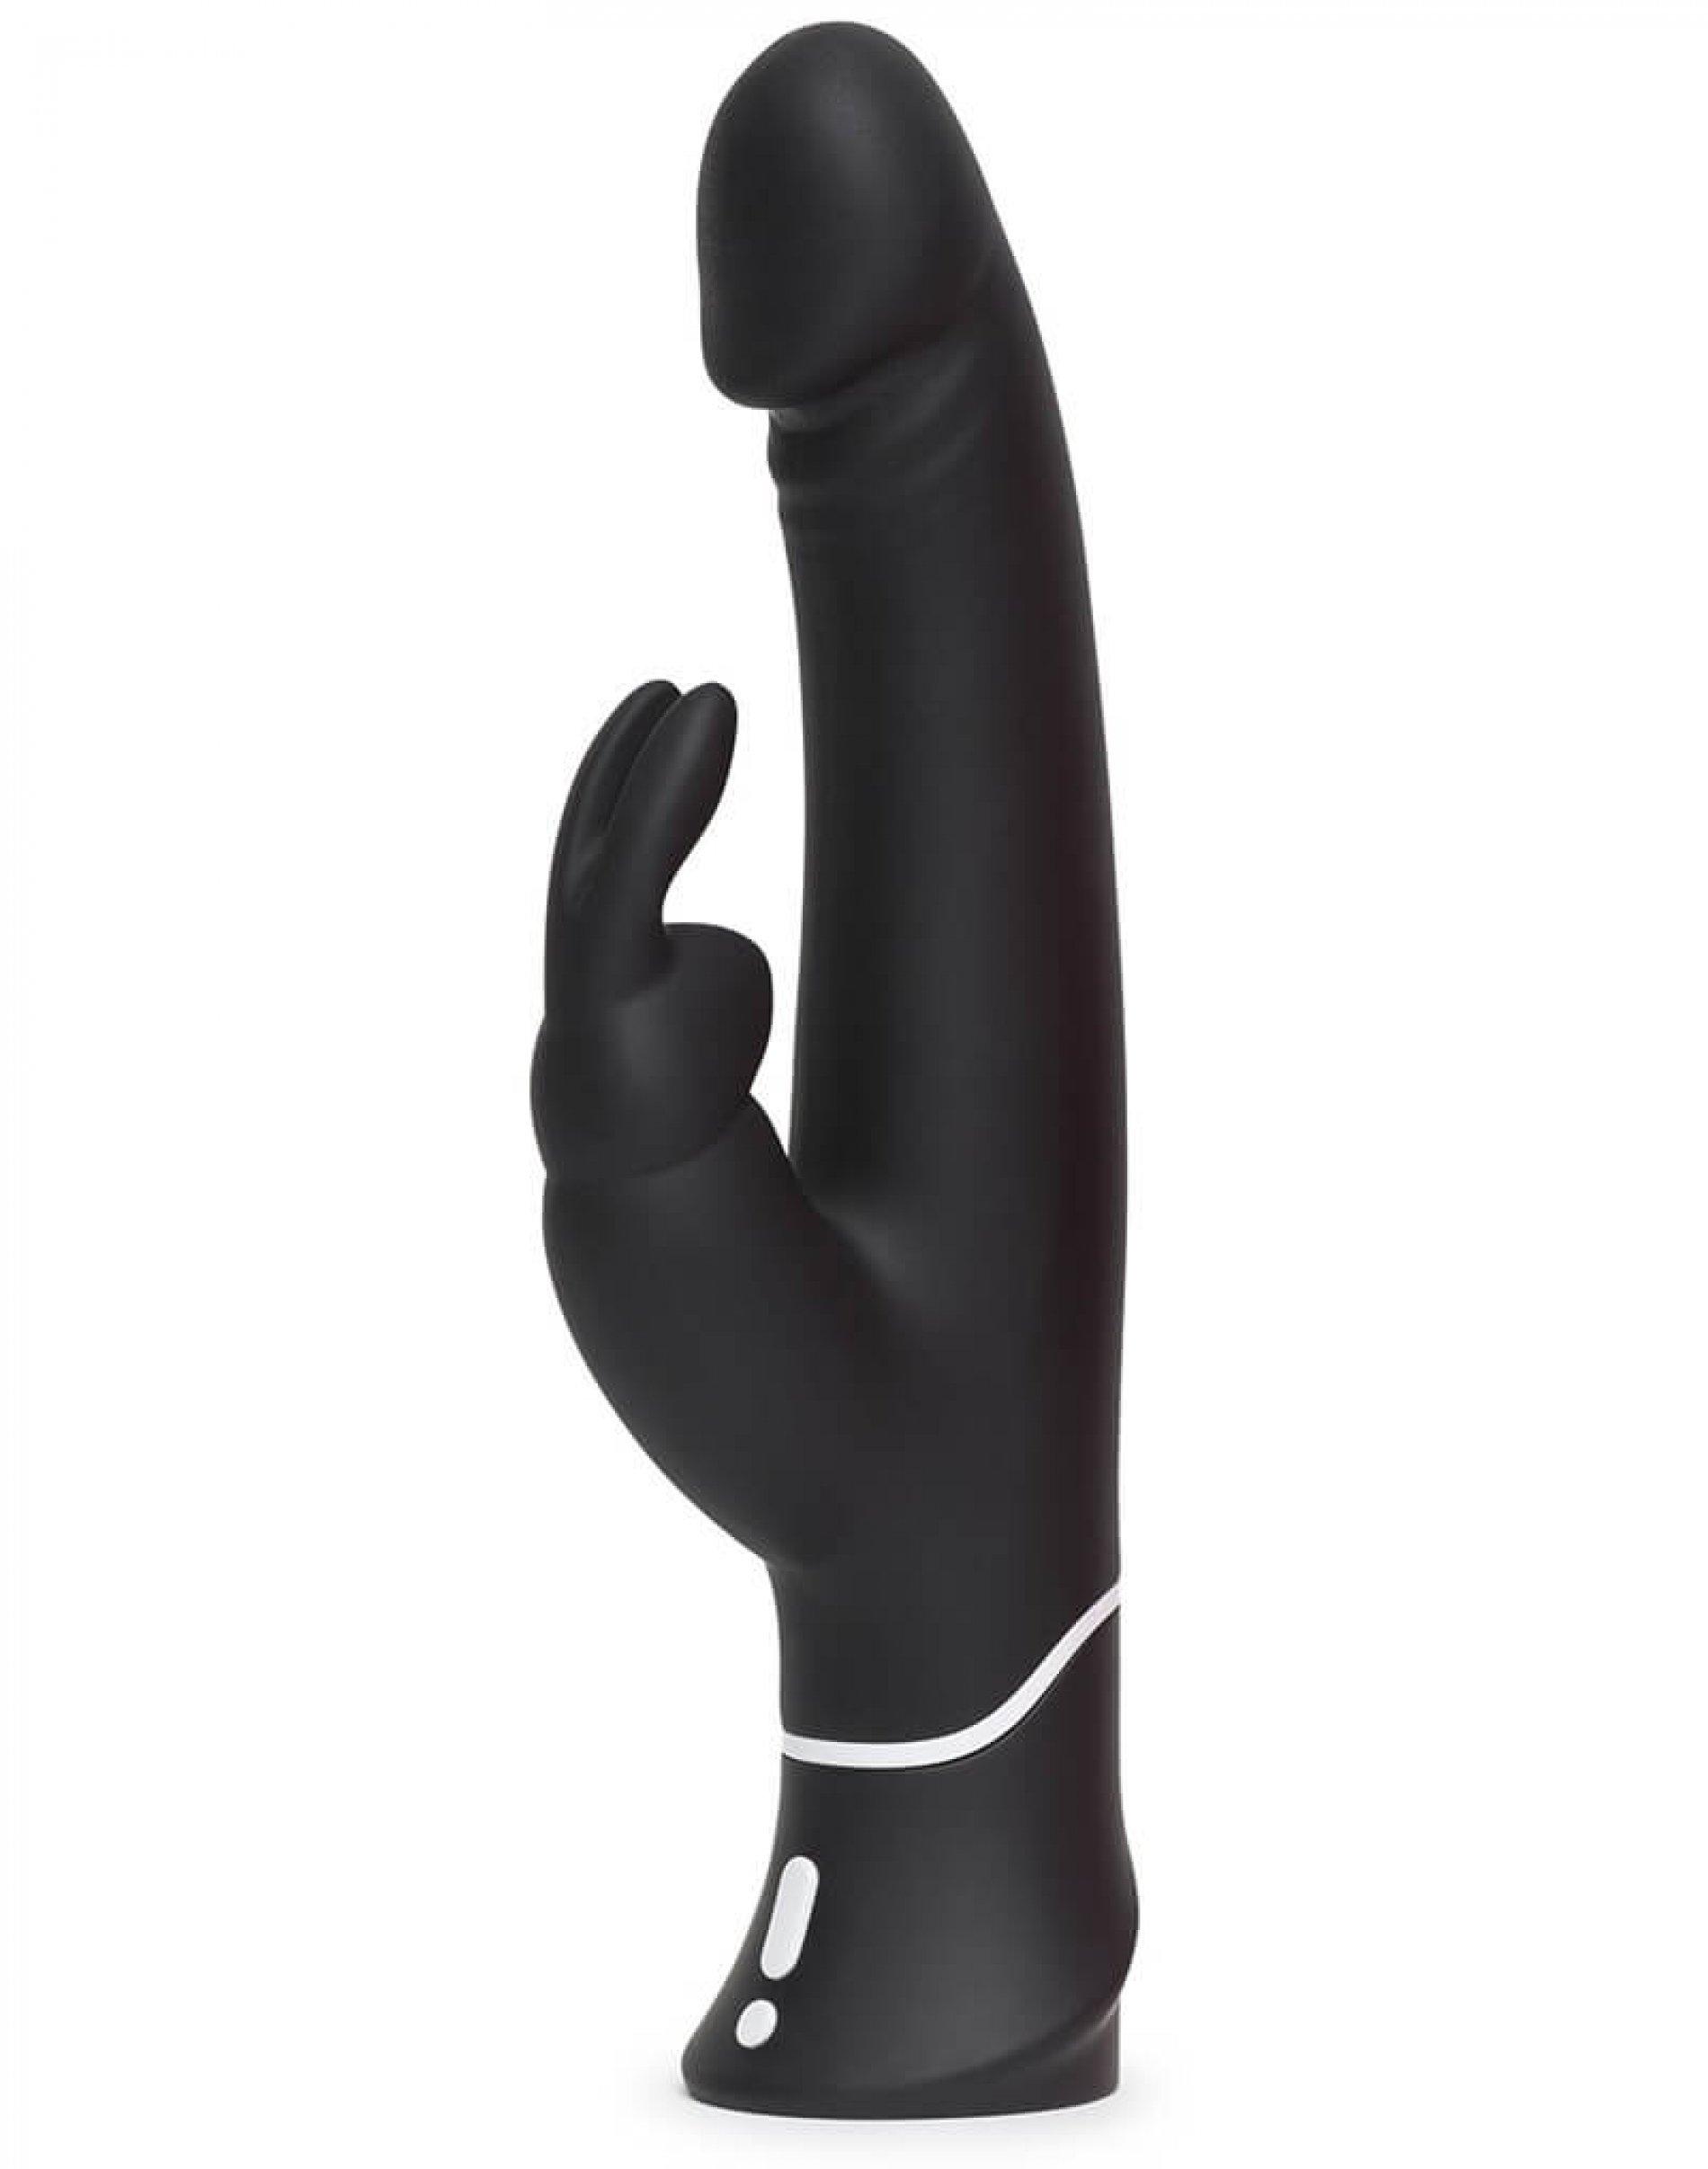 Happyrabbit realistic vibrator